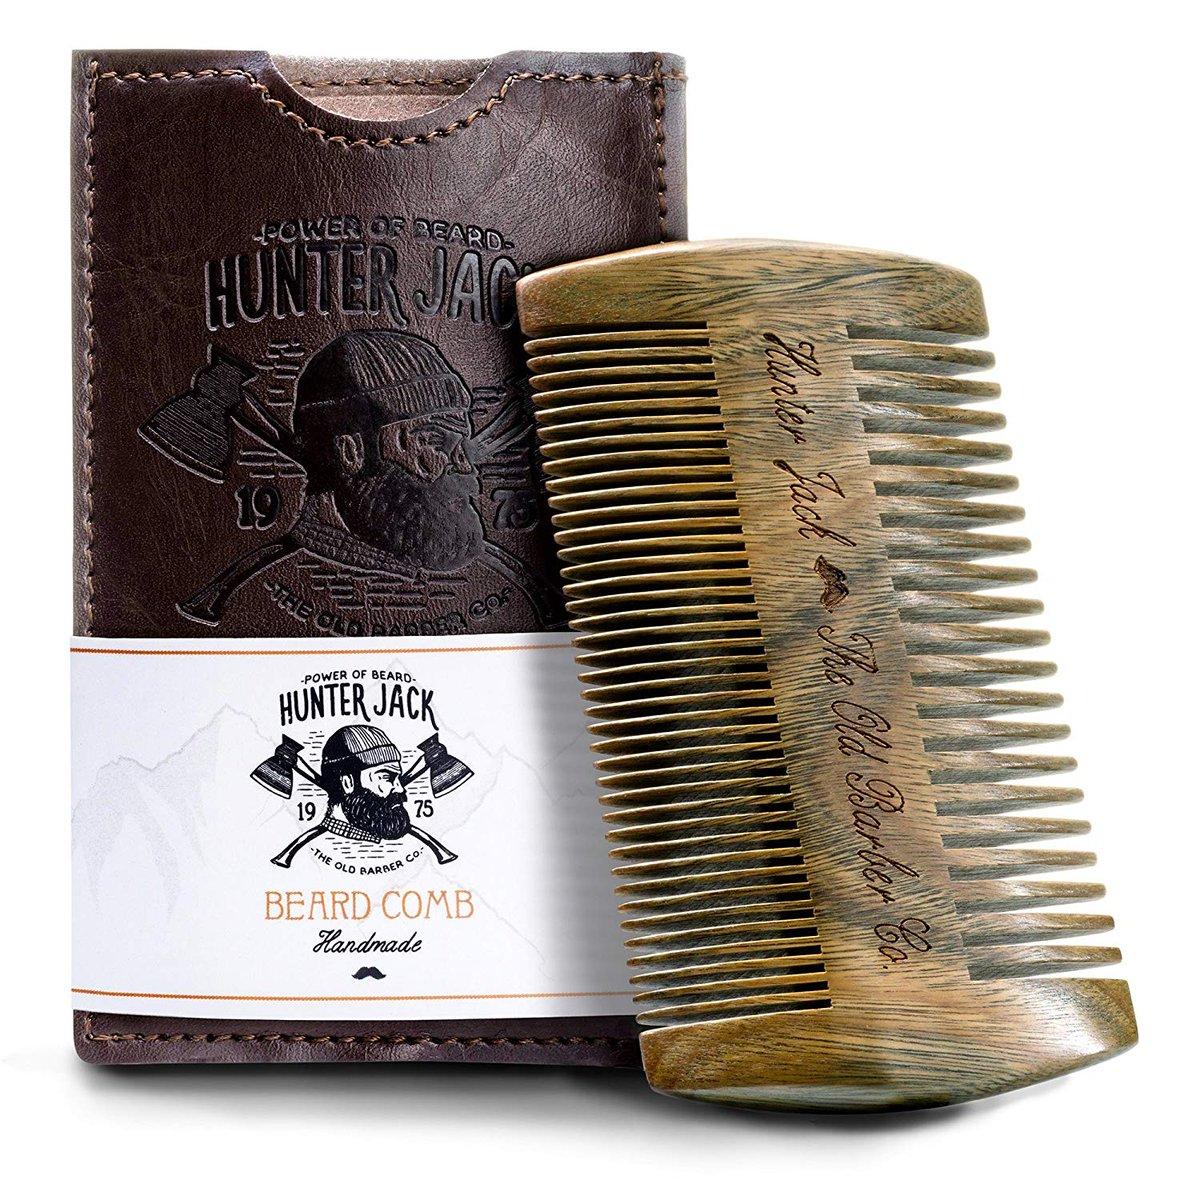 100% HANDMADE FINISH  Beard Comb Kit for Men - Great for Head Hai... by Hunter Jack for $12.95 https://buff.ly/3aOGxfo via @amazon  #beardcombkit #beardkit #beardgrooming #grooming #facialhair #beauty #skincare #beardcombpic.twitter.com/c4i5k3Z2uK